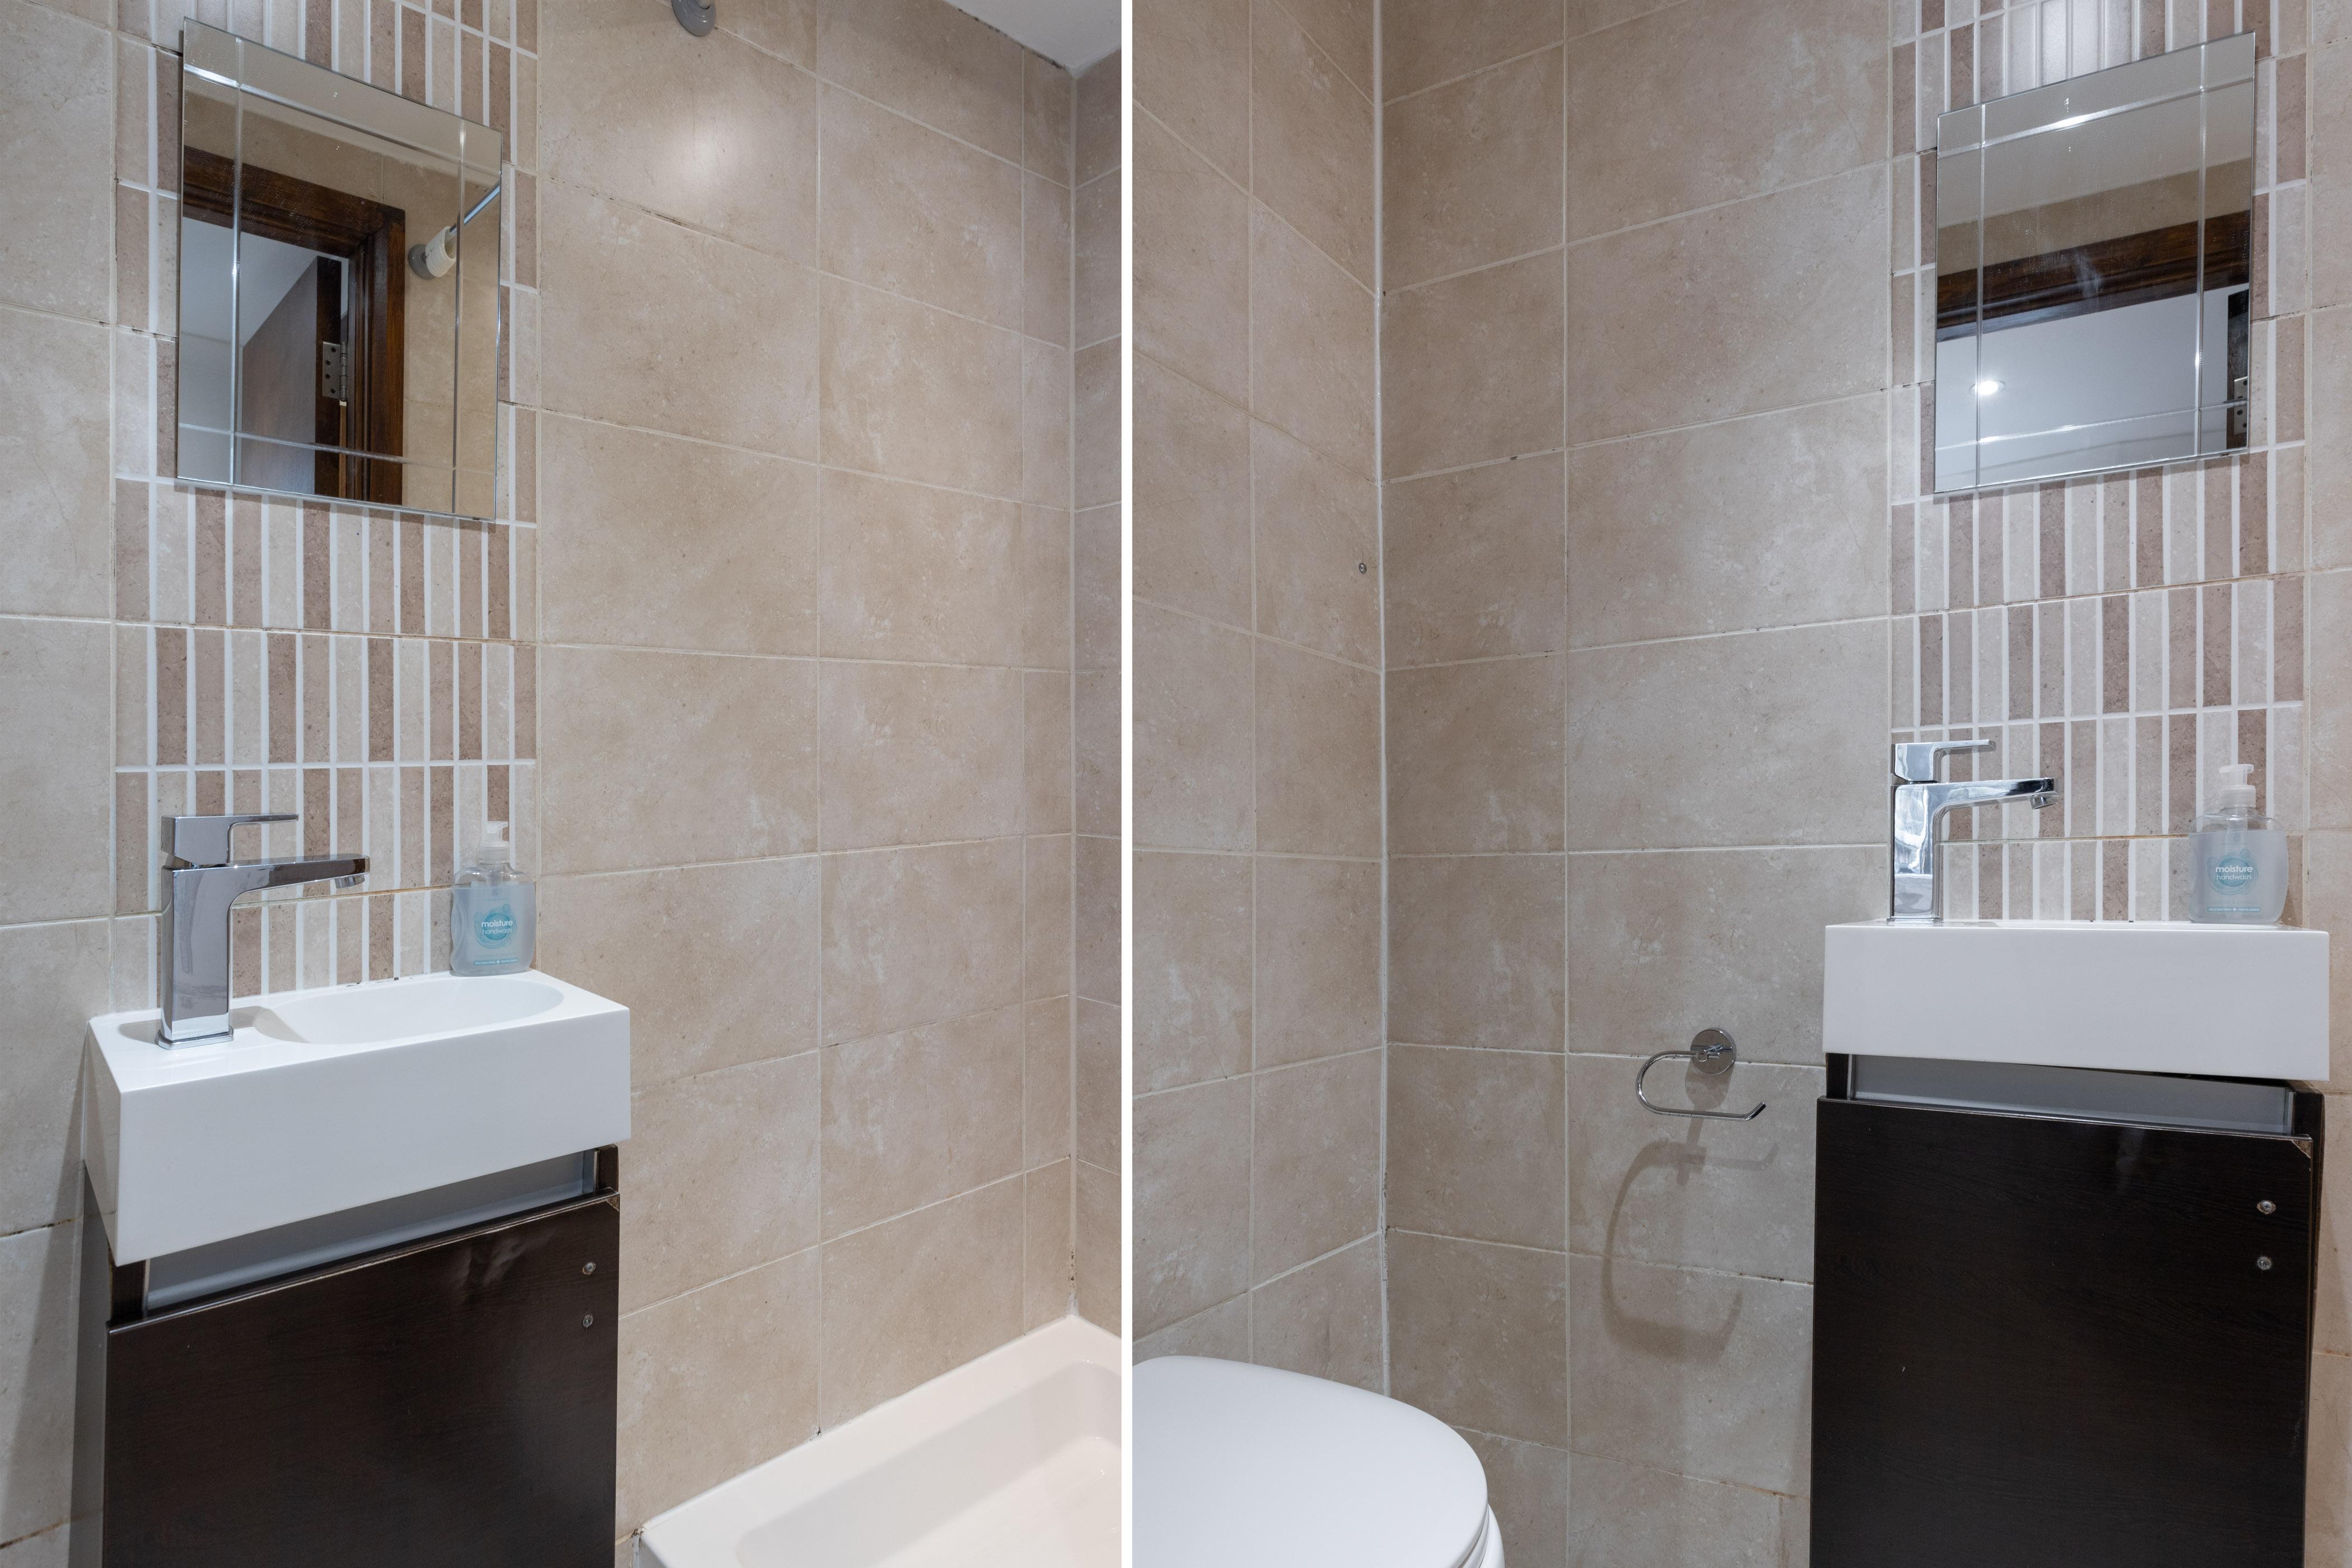 Apartment King s Cross Eurostar Double Room - Shared Bathroom - Shared Kitchen  ROOM 4  photo 26059387